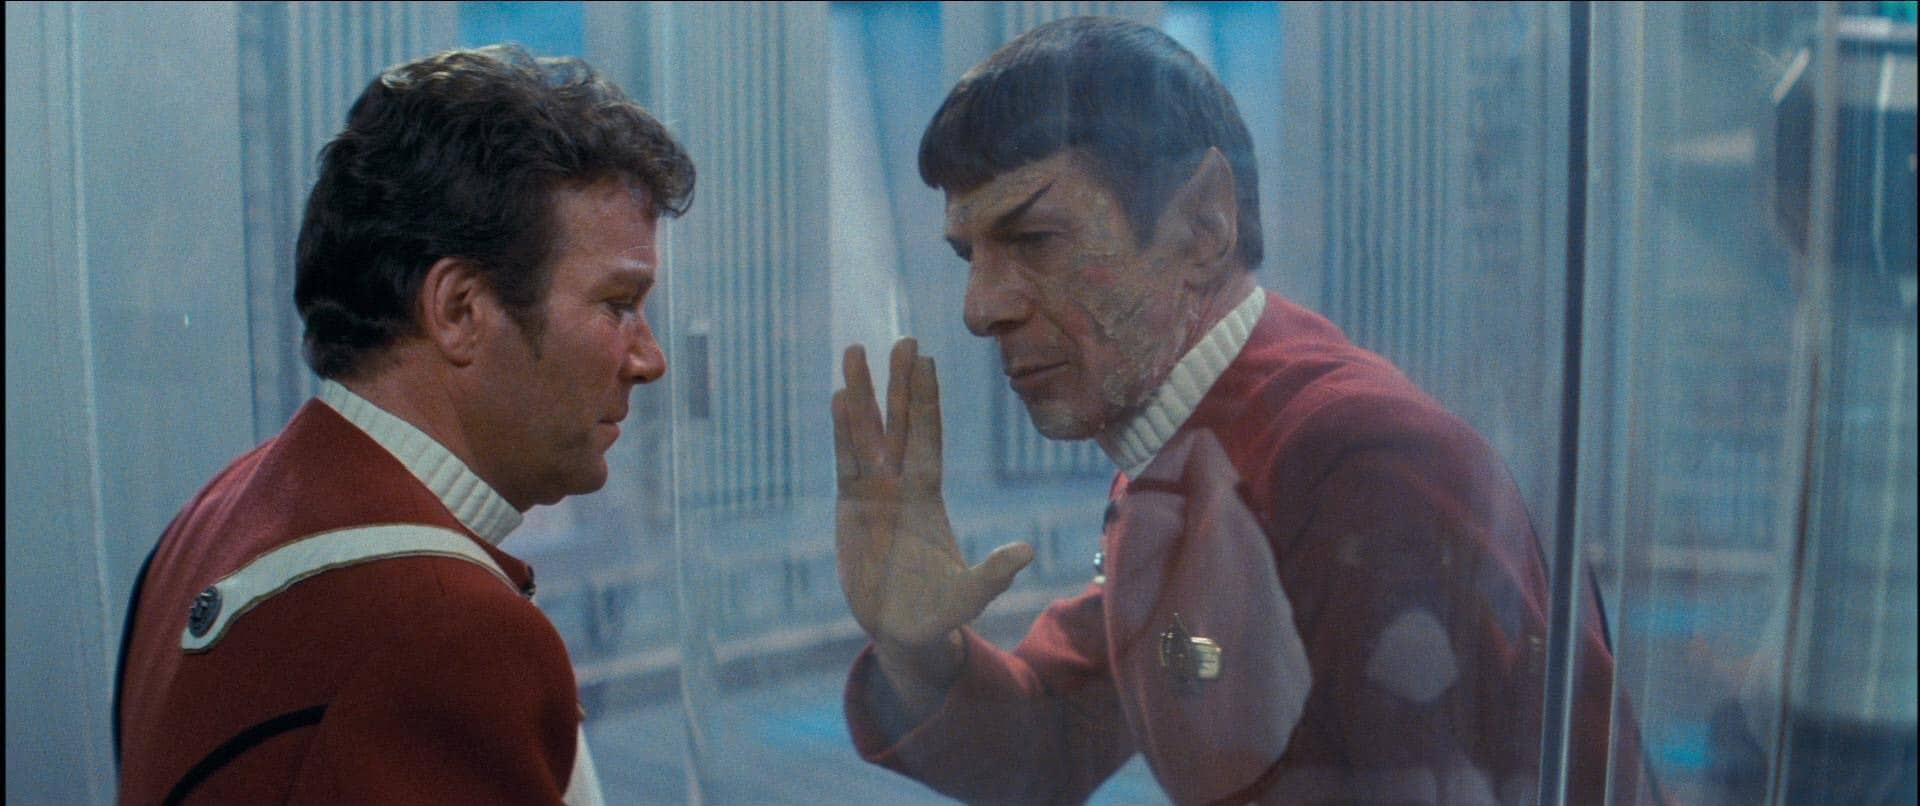 Spocks-death.jpg